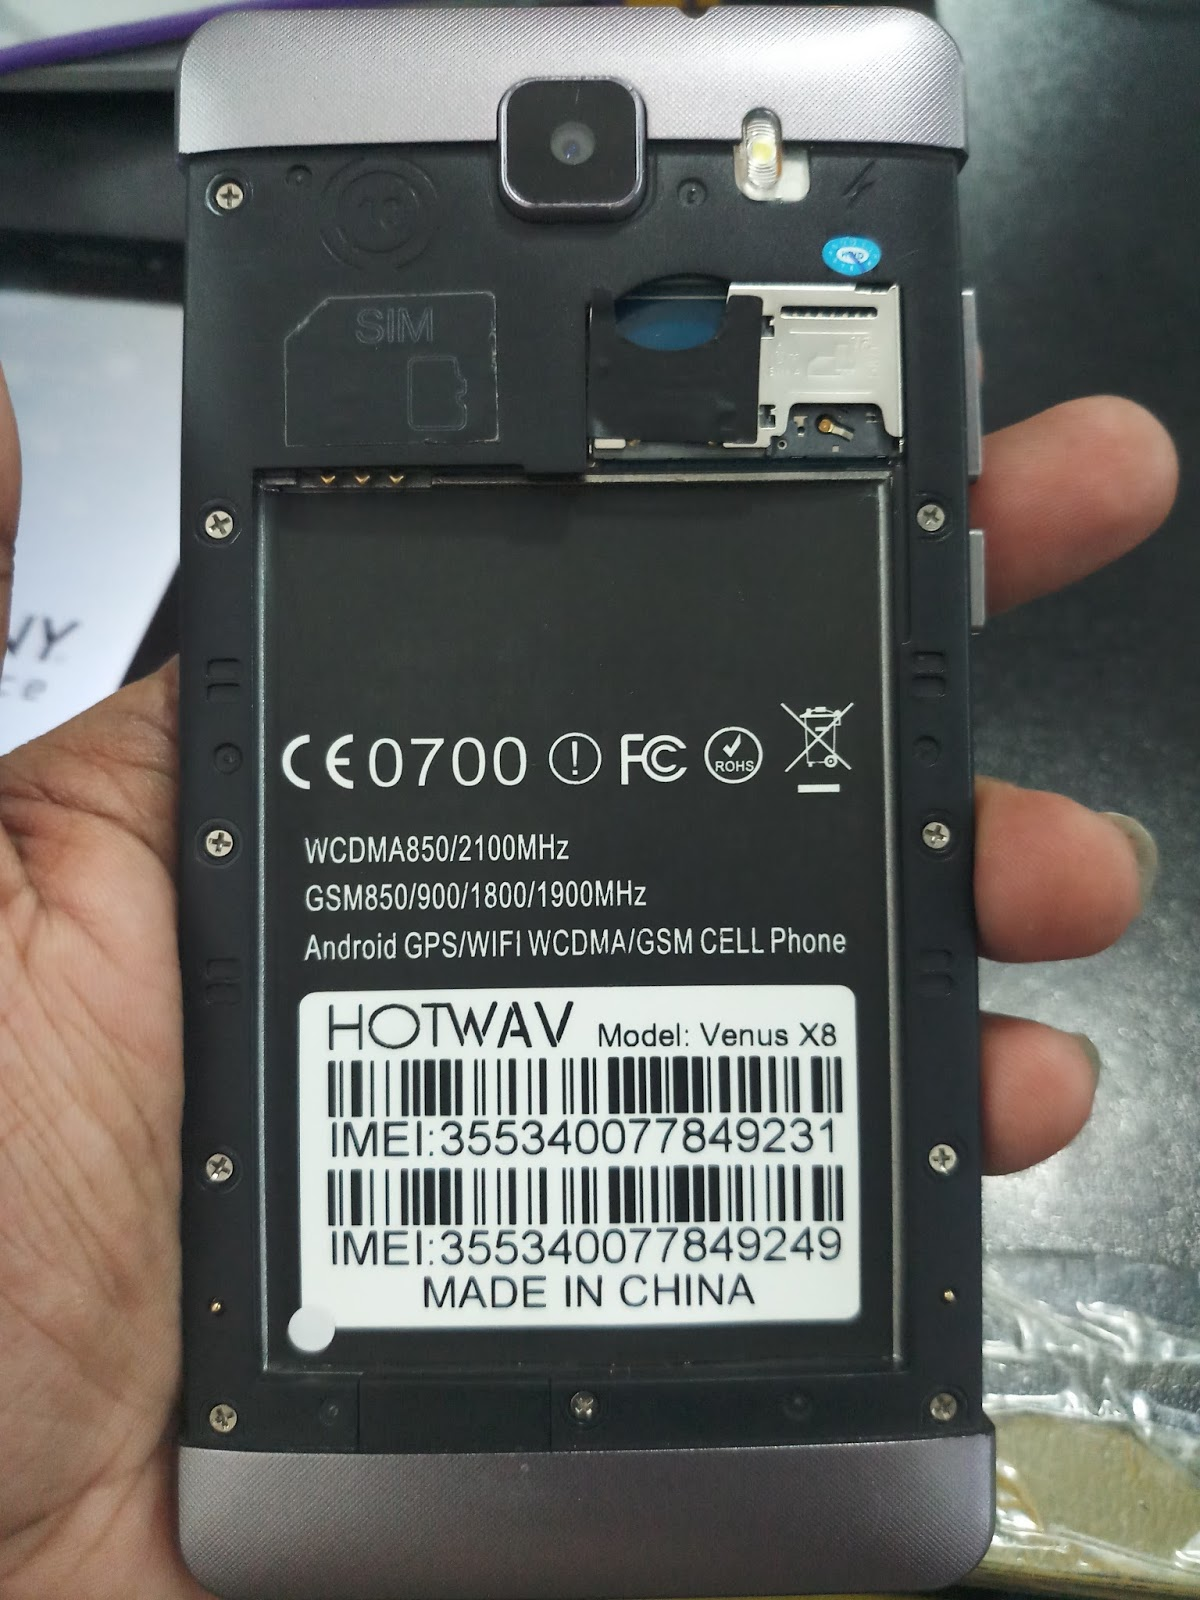 Hotwav Venus X8 Display Fix Dead Recovery Flash File Death